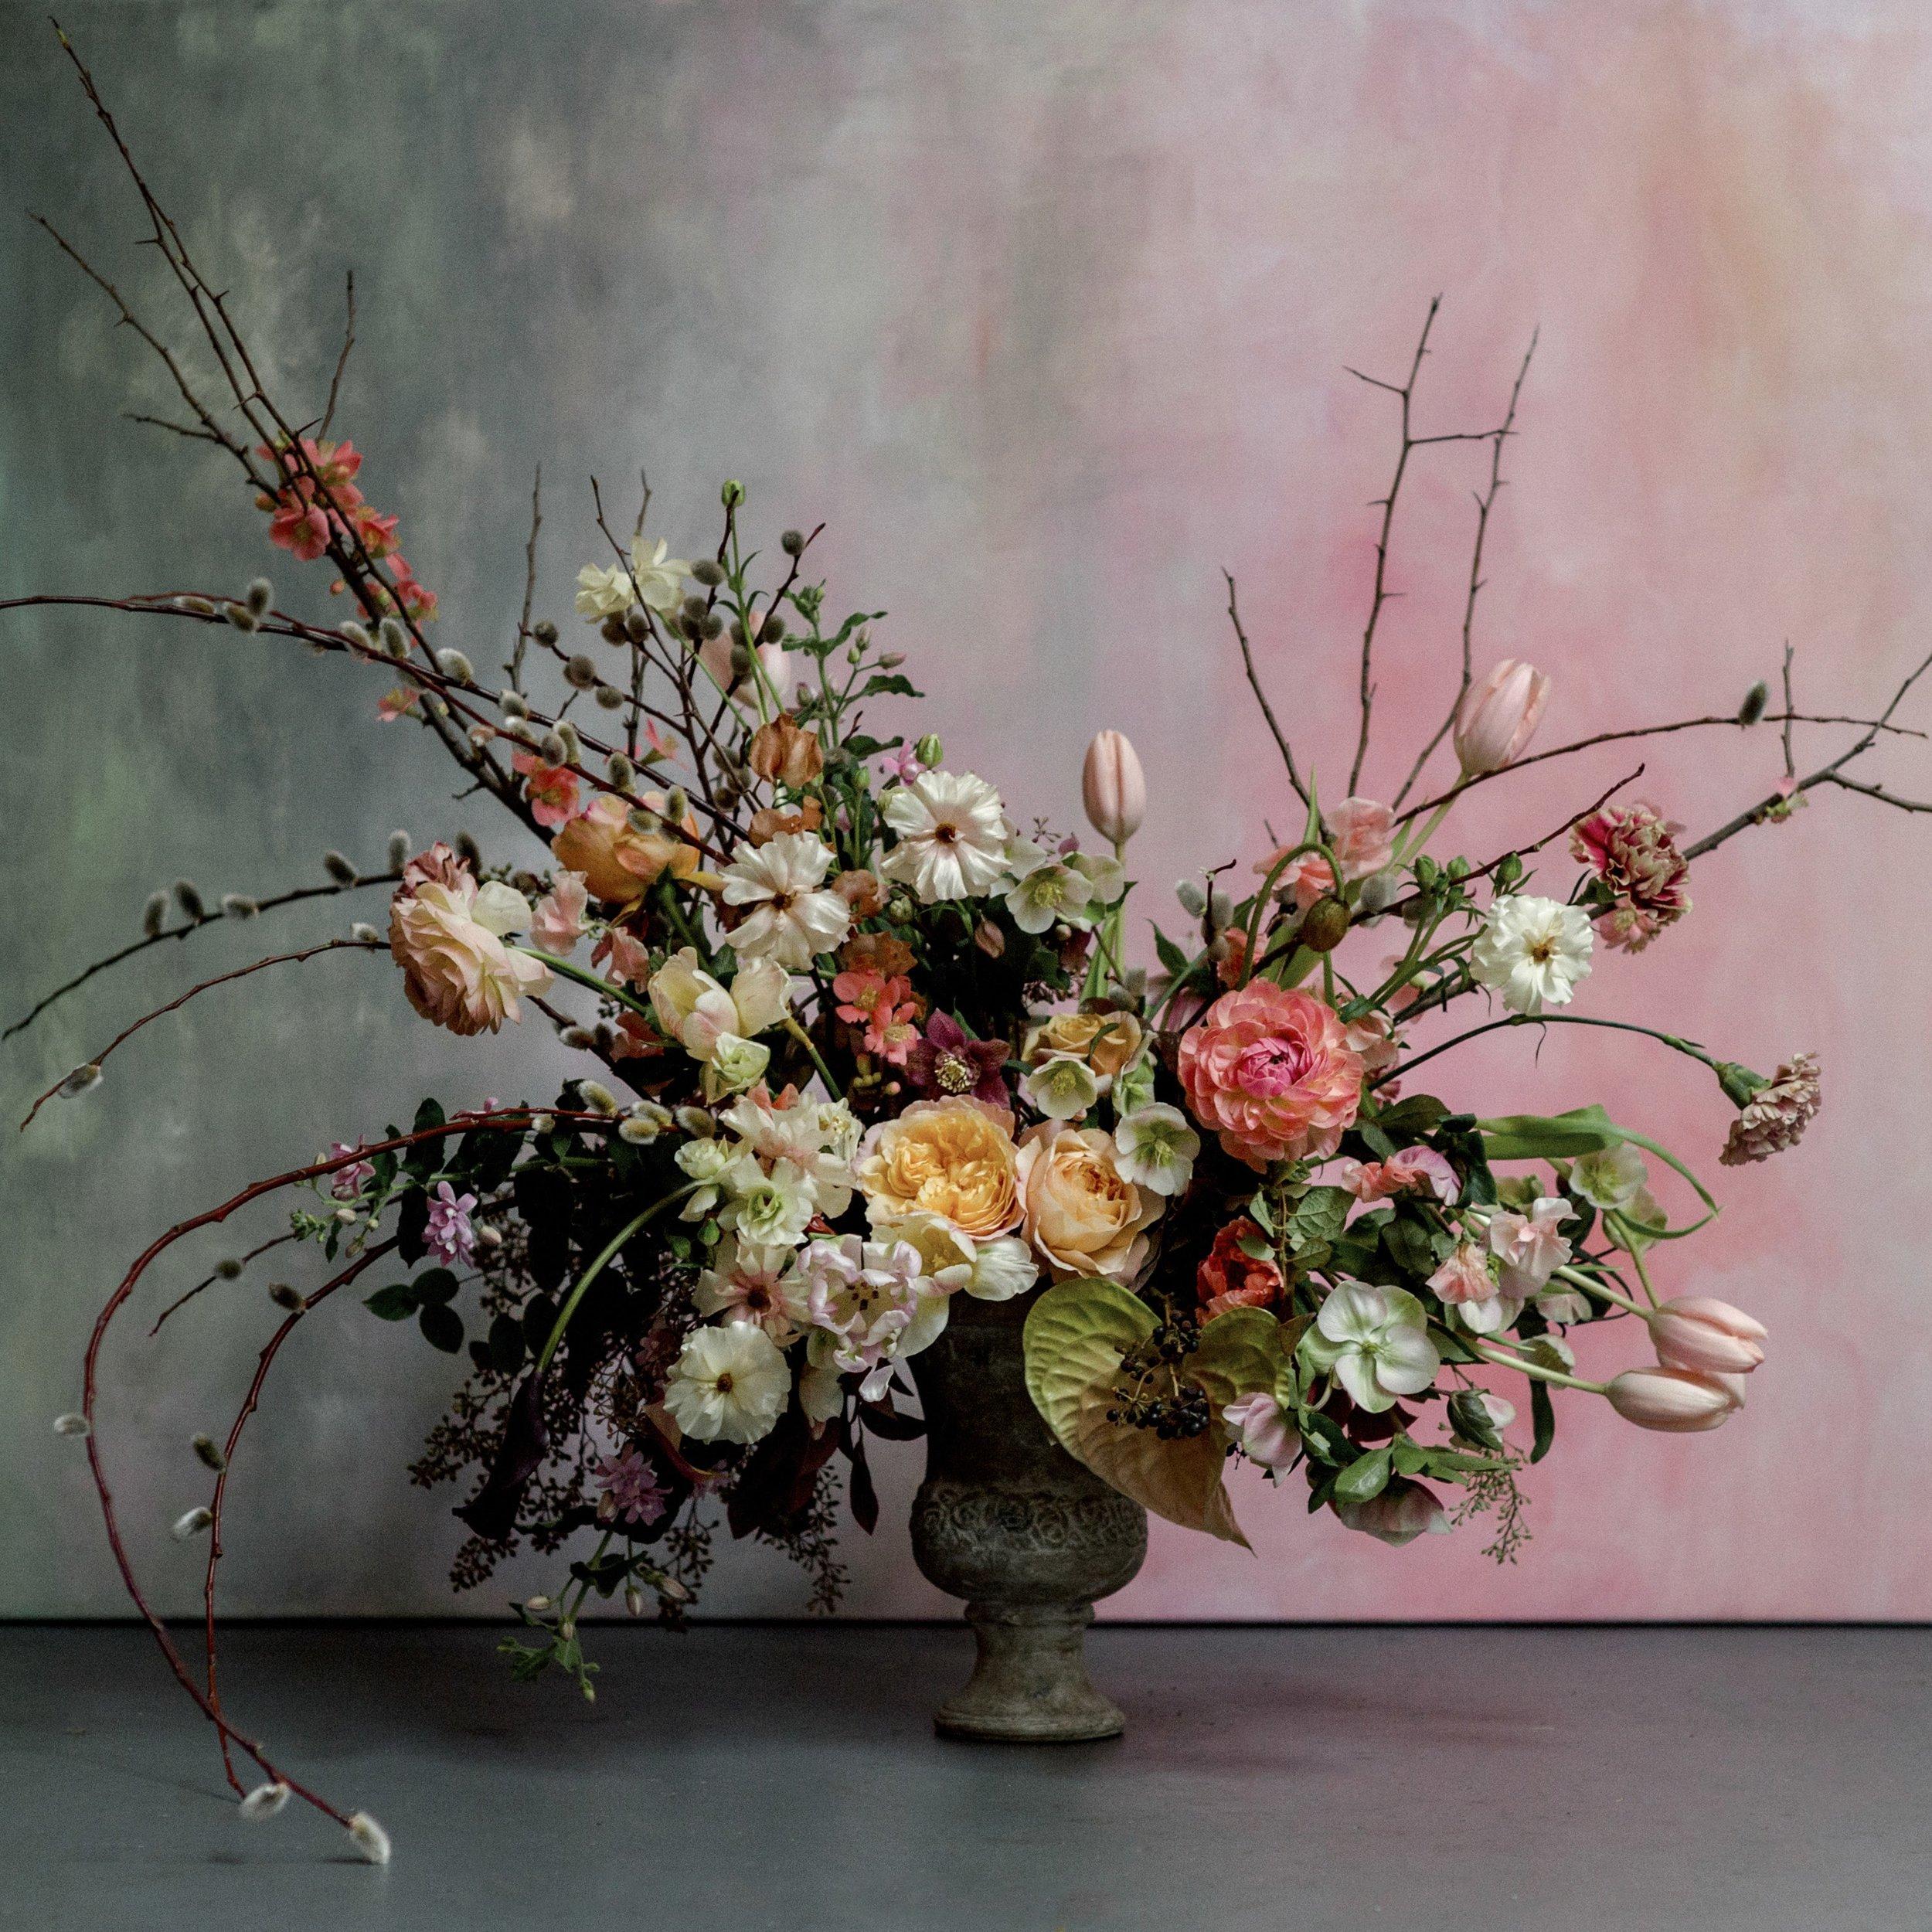 cindy loughridge photography-tulipina design-005.jpg